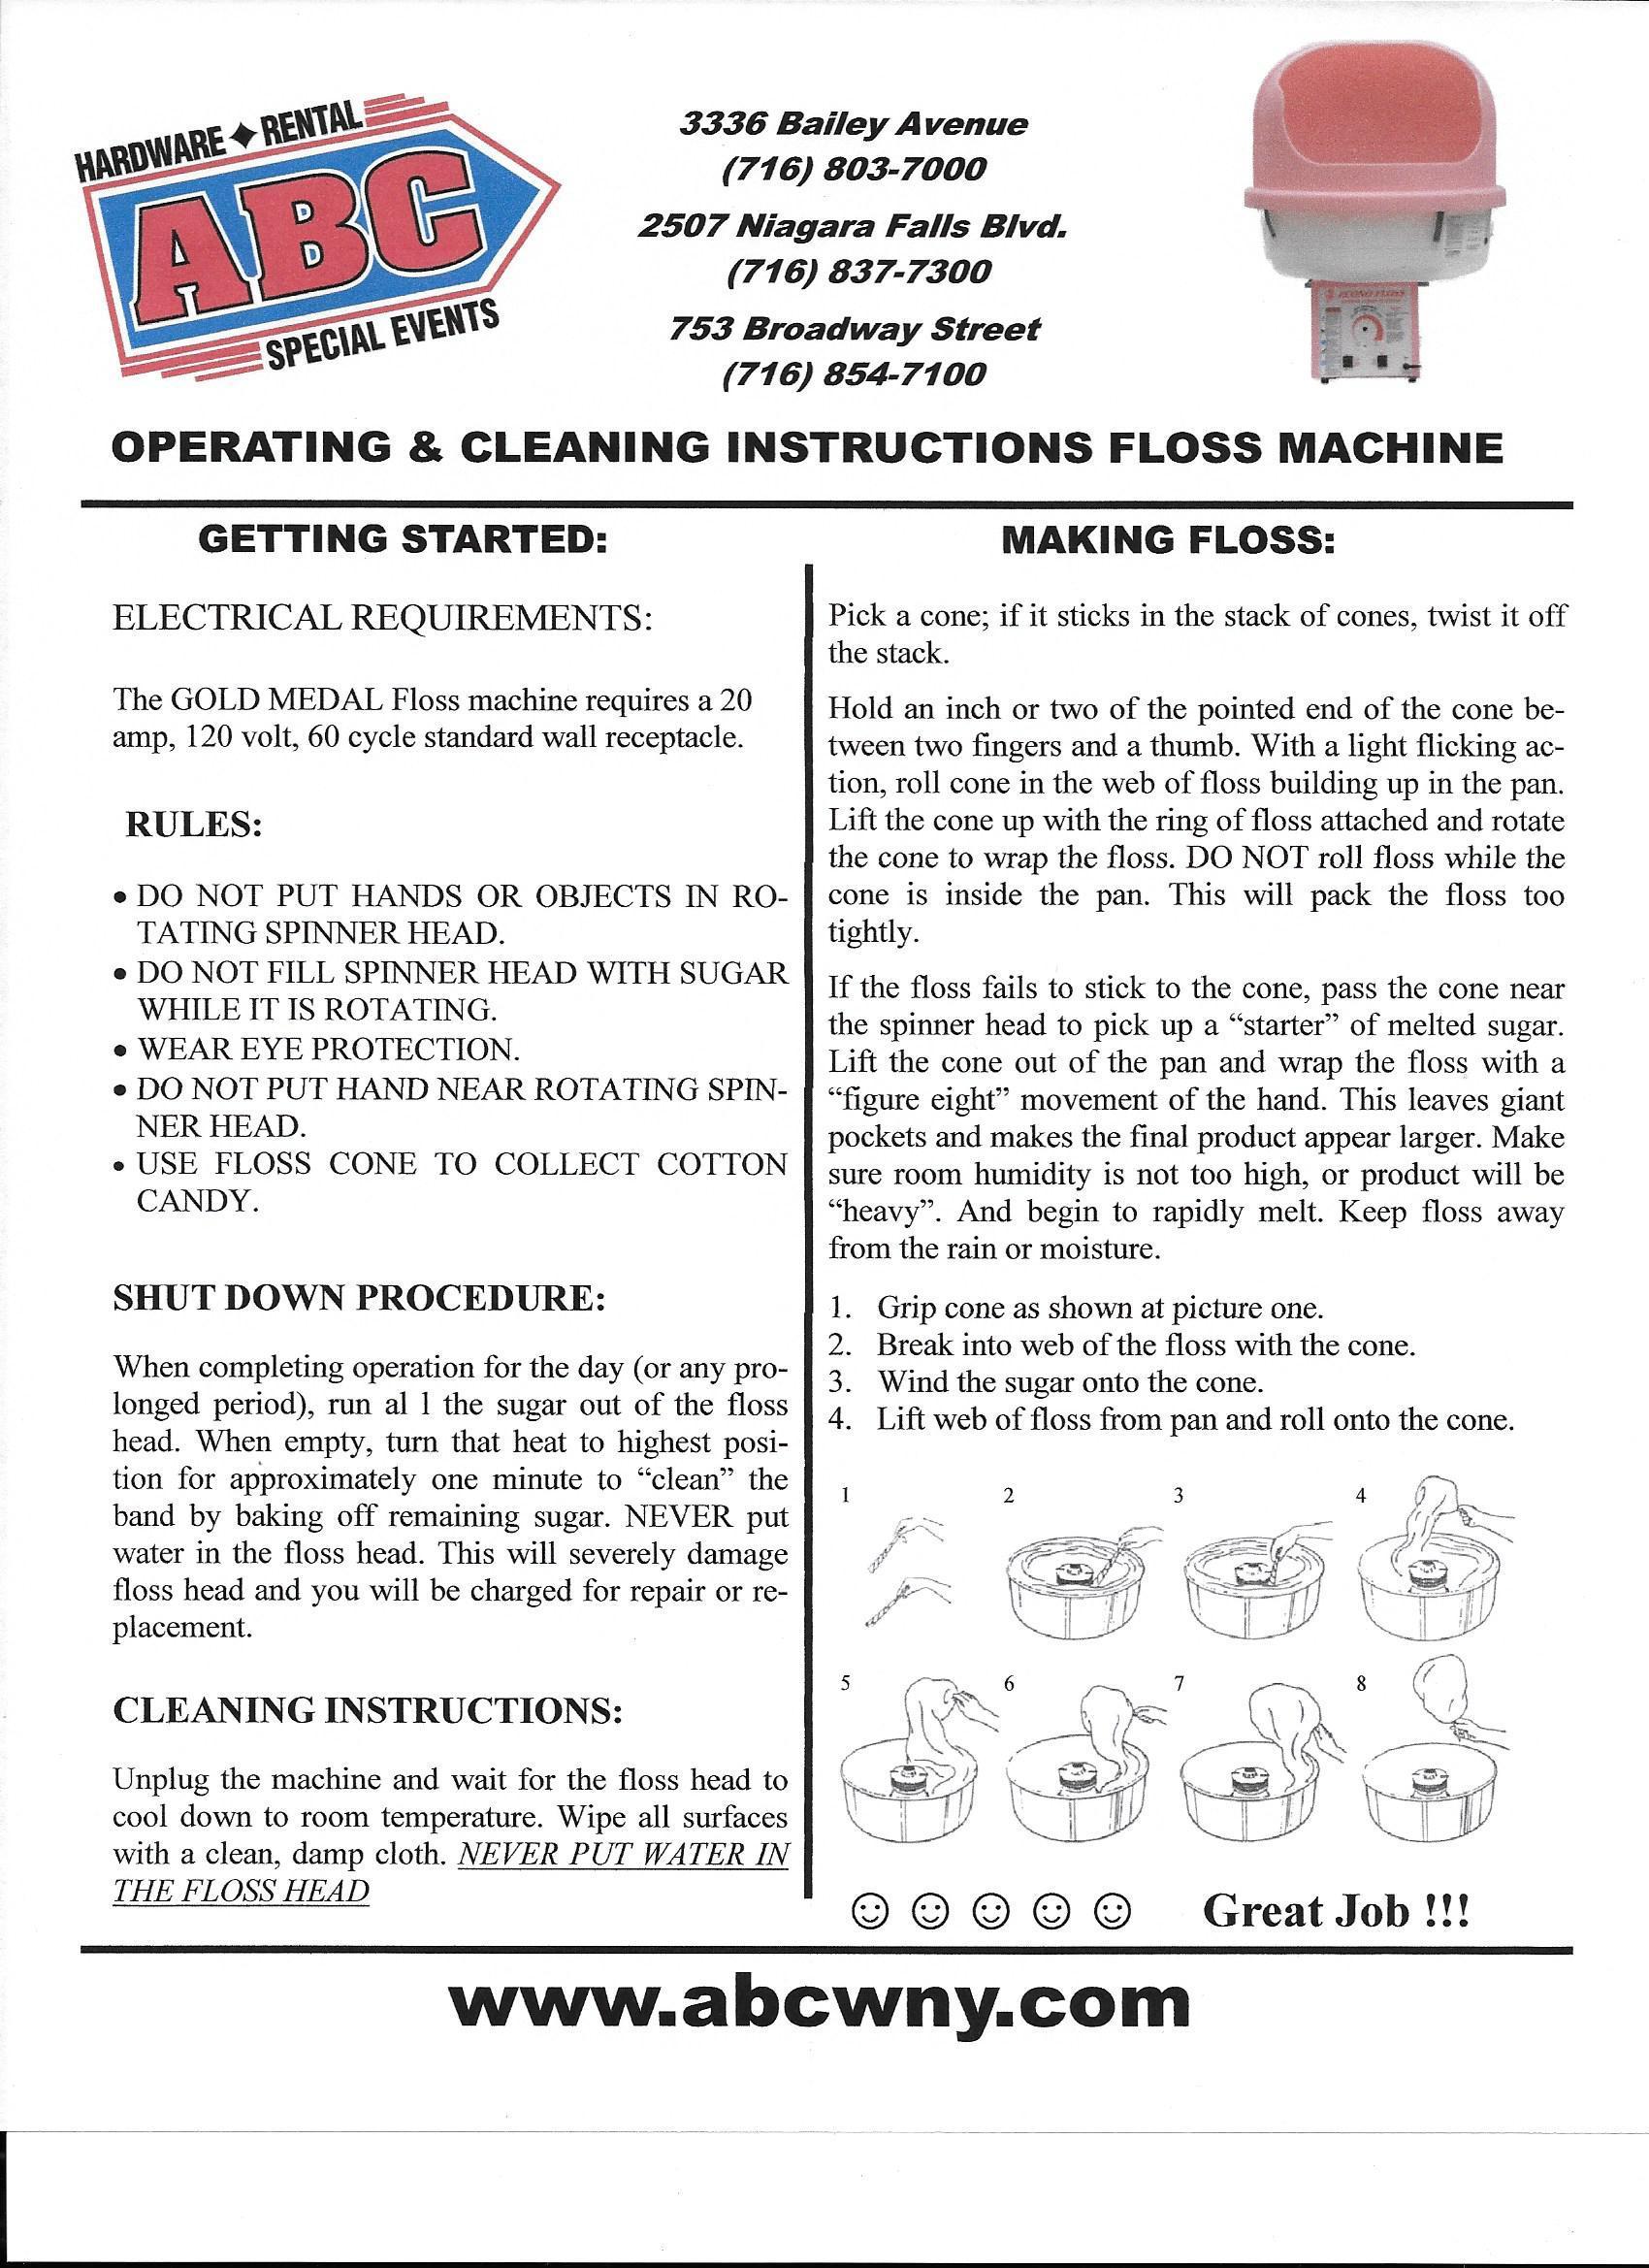 funfood-instructions0002.jpg